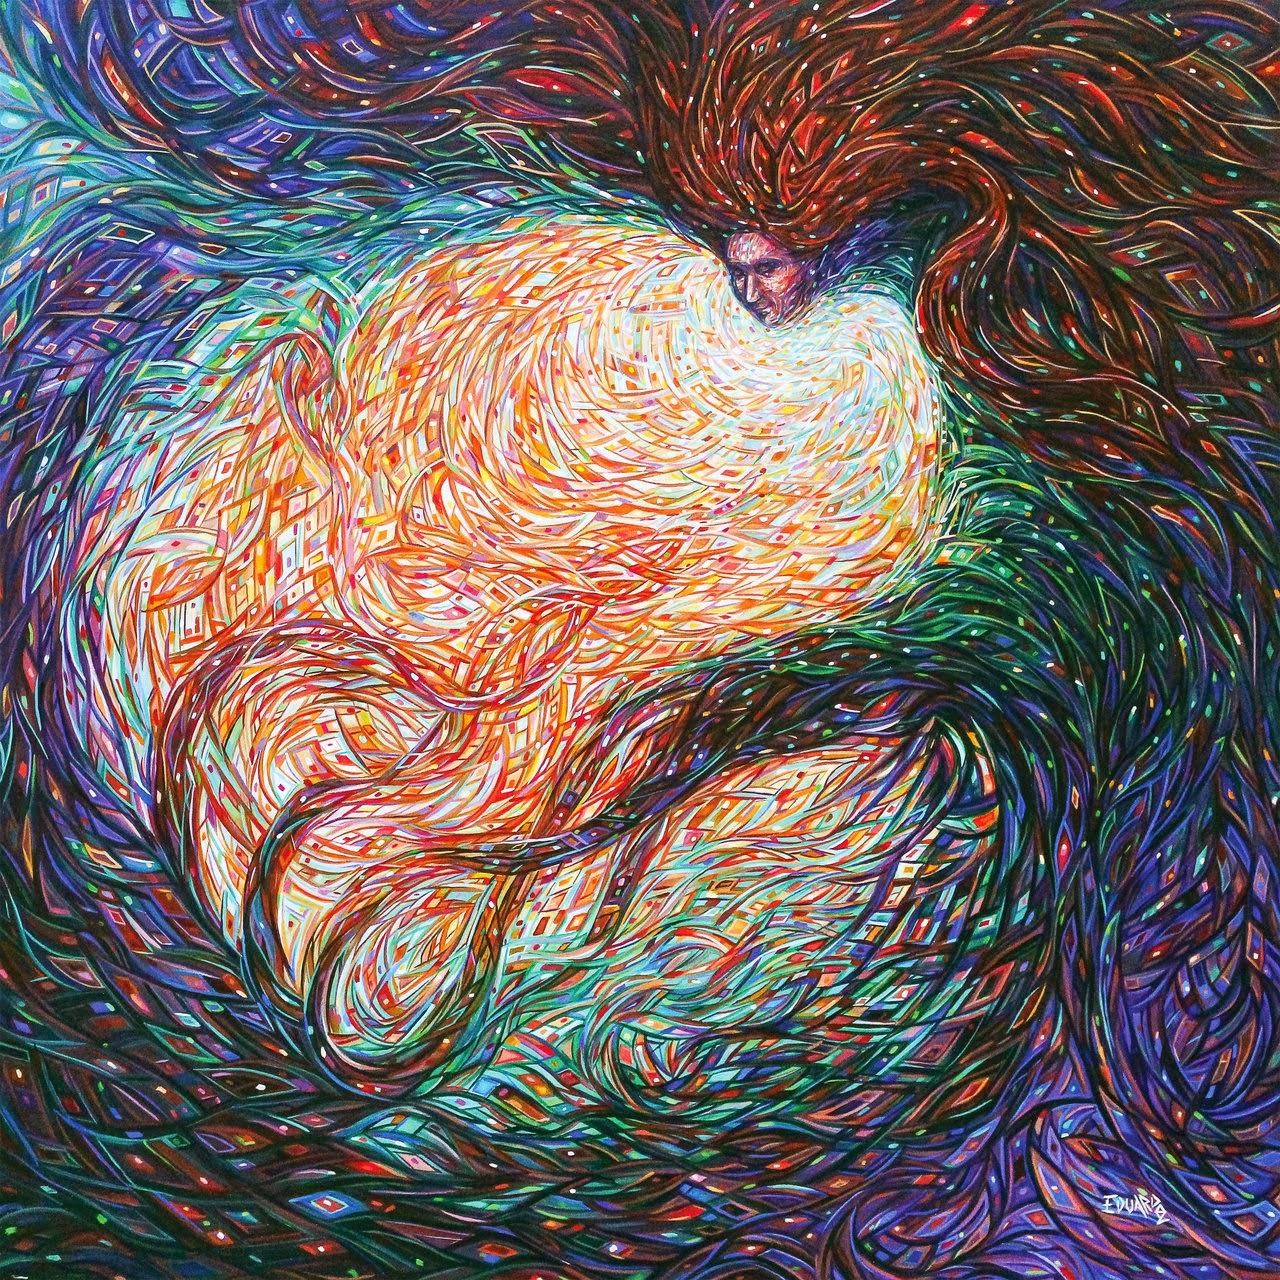 08-Origins-of-Nature-Eduardo-R-Calzado-Paintings-in-Swirls-of-Colour-www-designstack-co